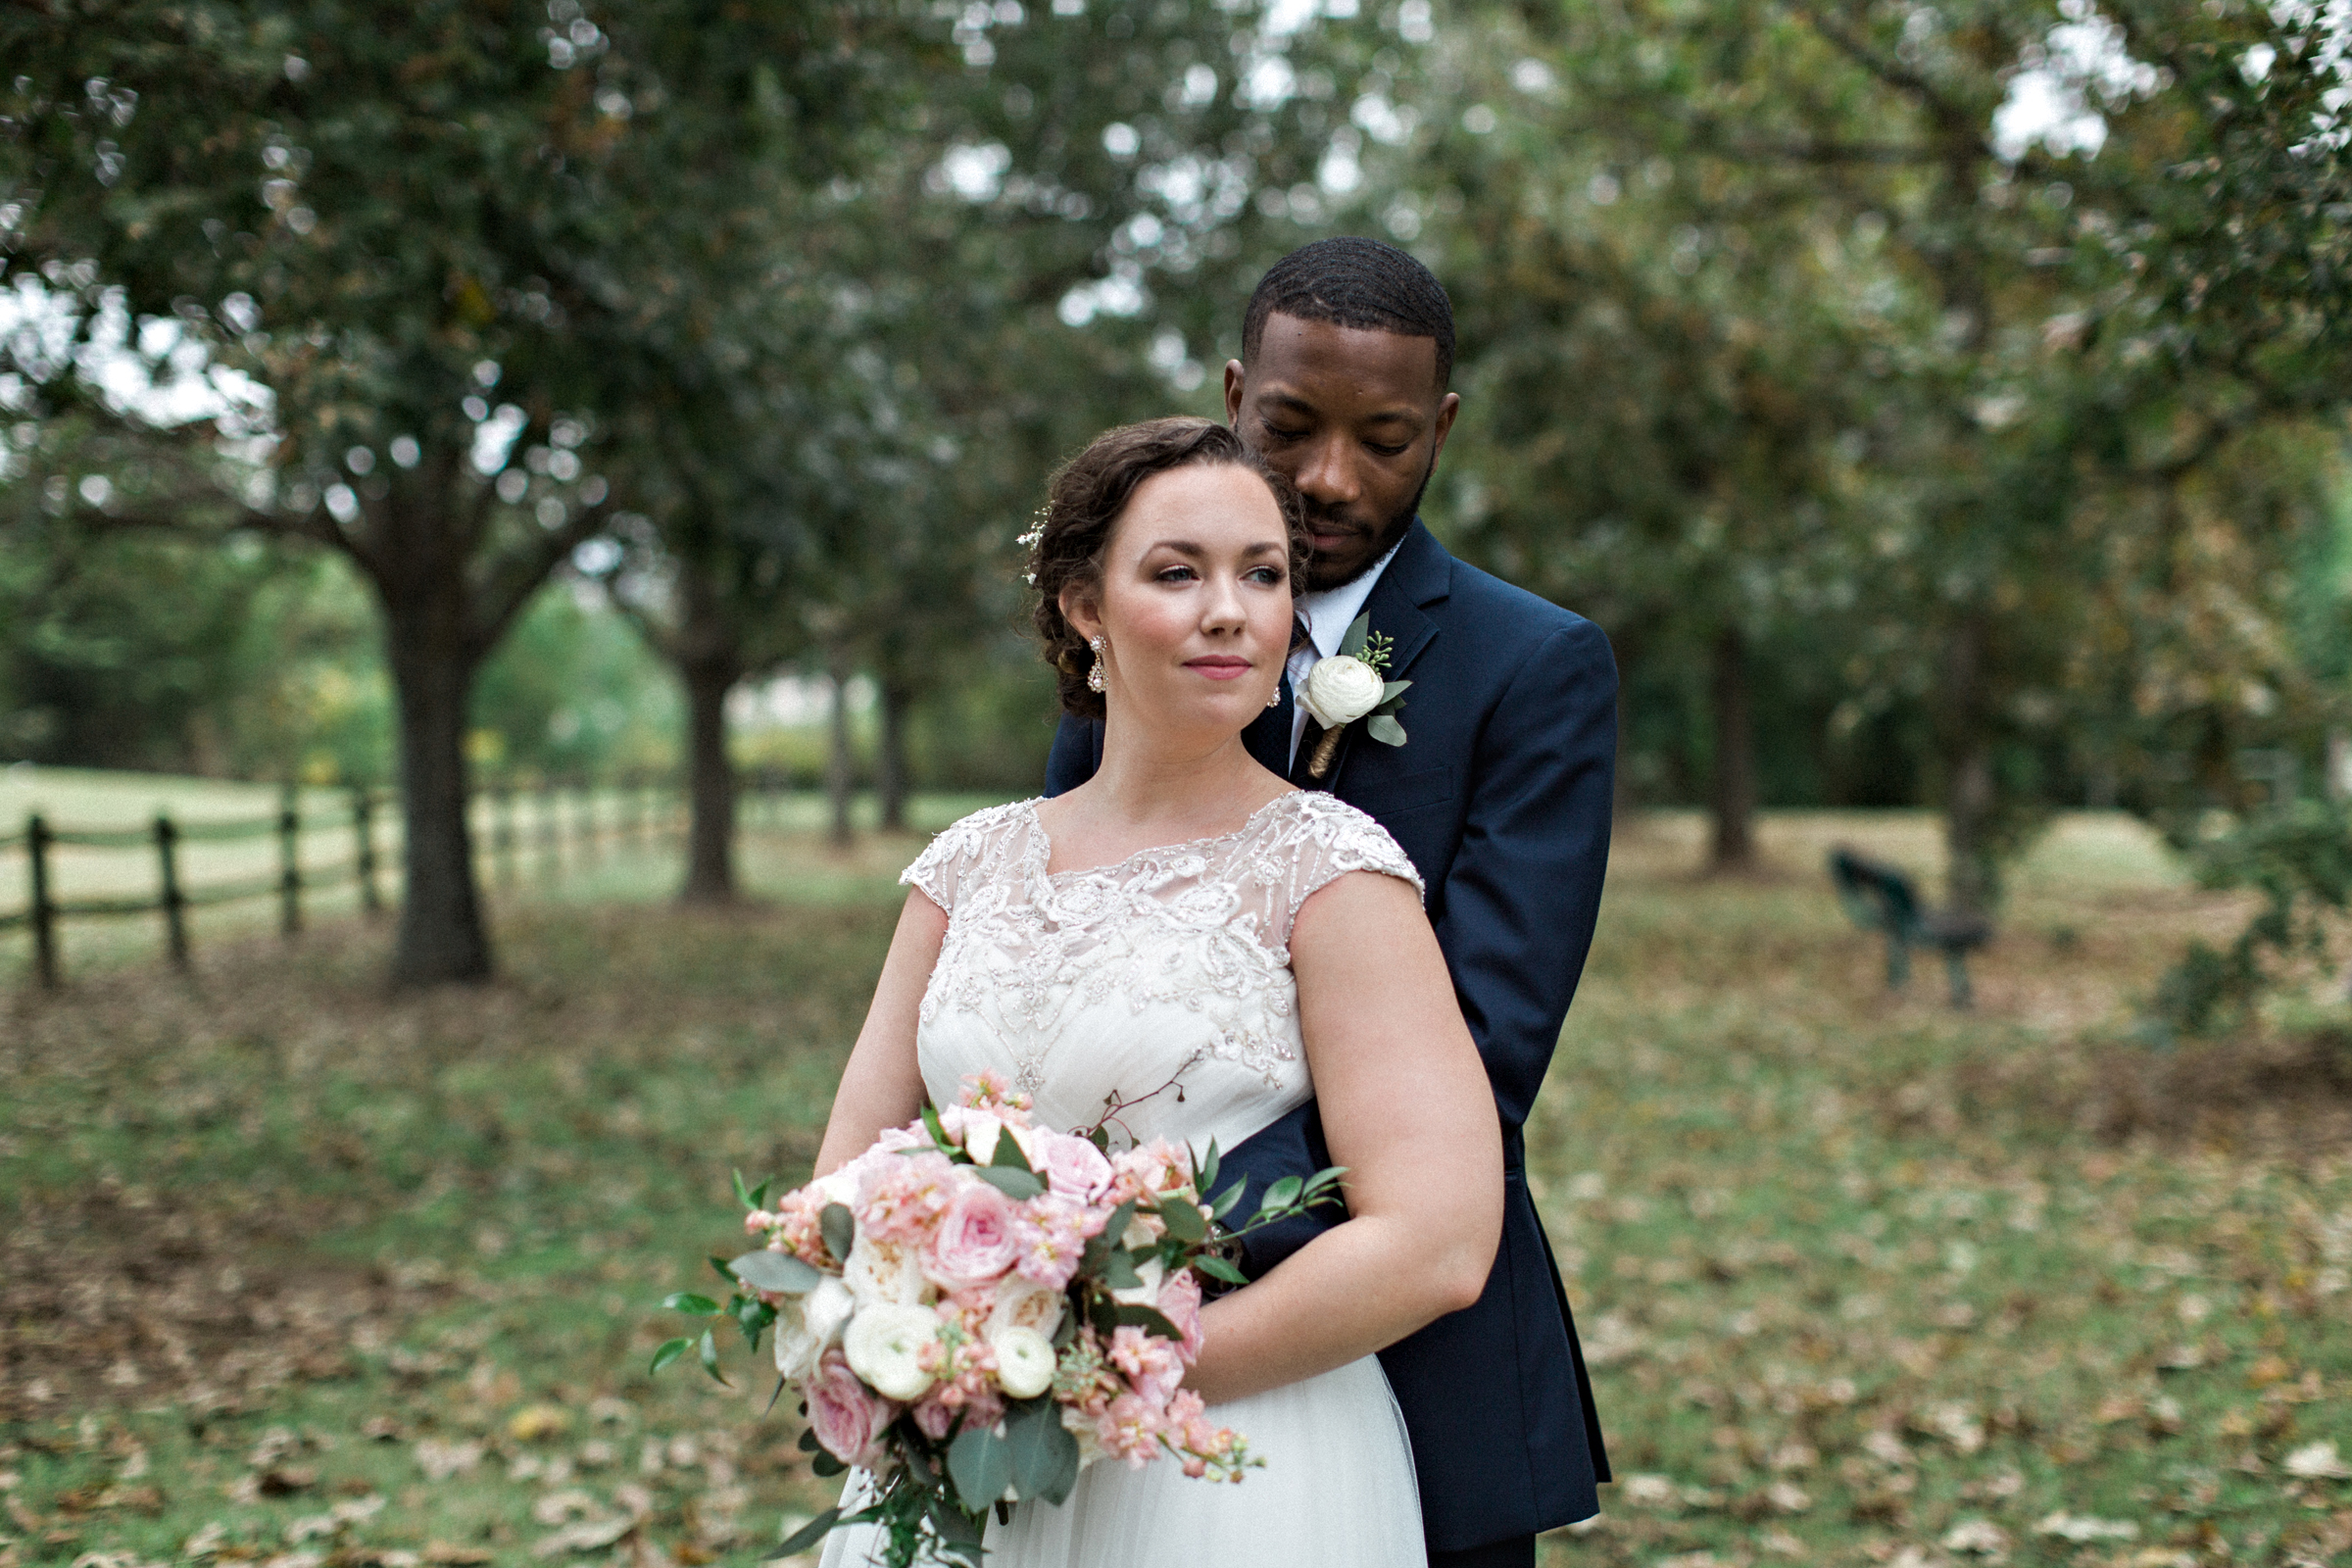 Alabama-Wedding-Photography-Nick-Drollette-Cory-Laura-128.jpg